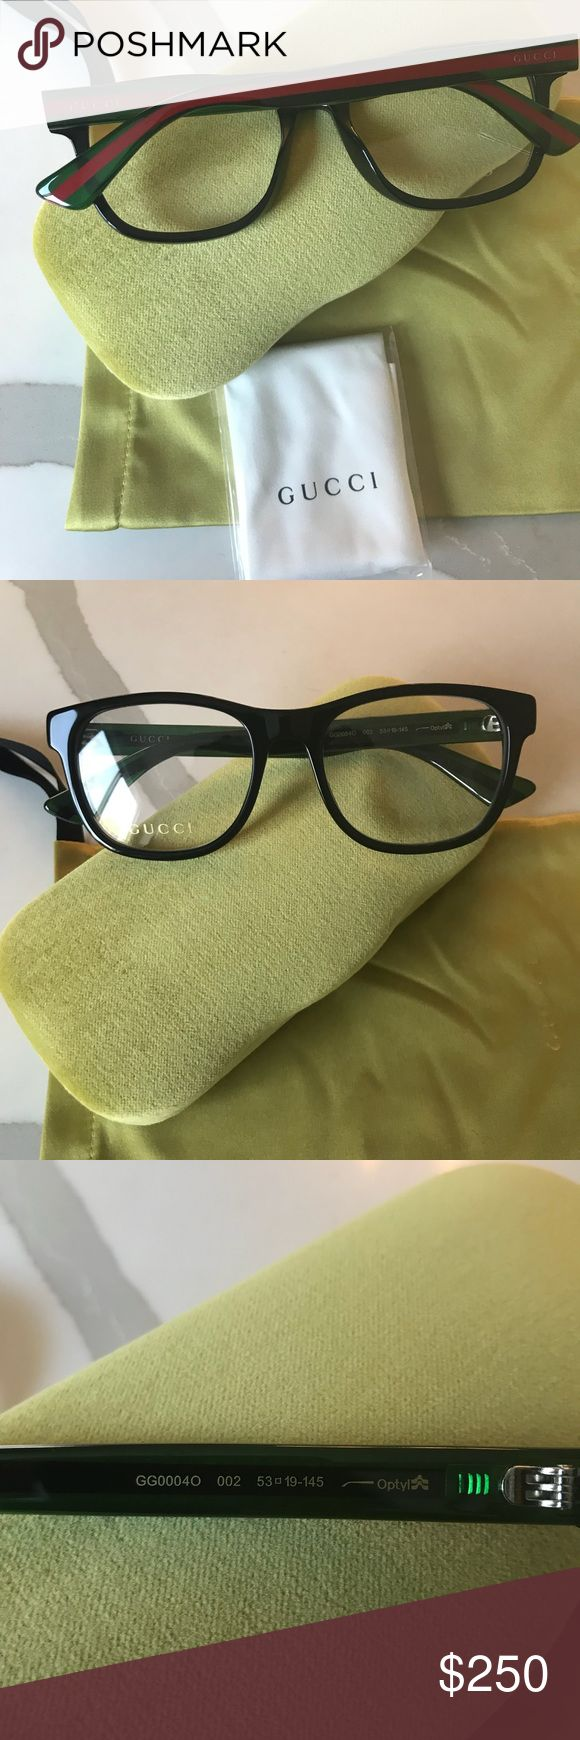 999b25cf579f8 New Gucci Eyeglasses Gg 1008 Gg1008 51n Black 55mm Rx Authentic